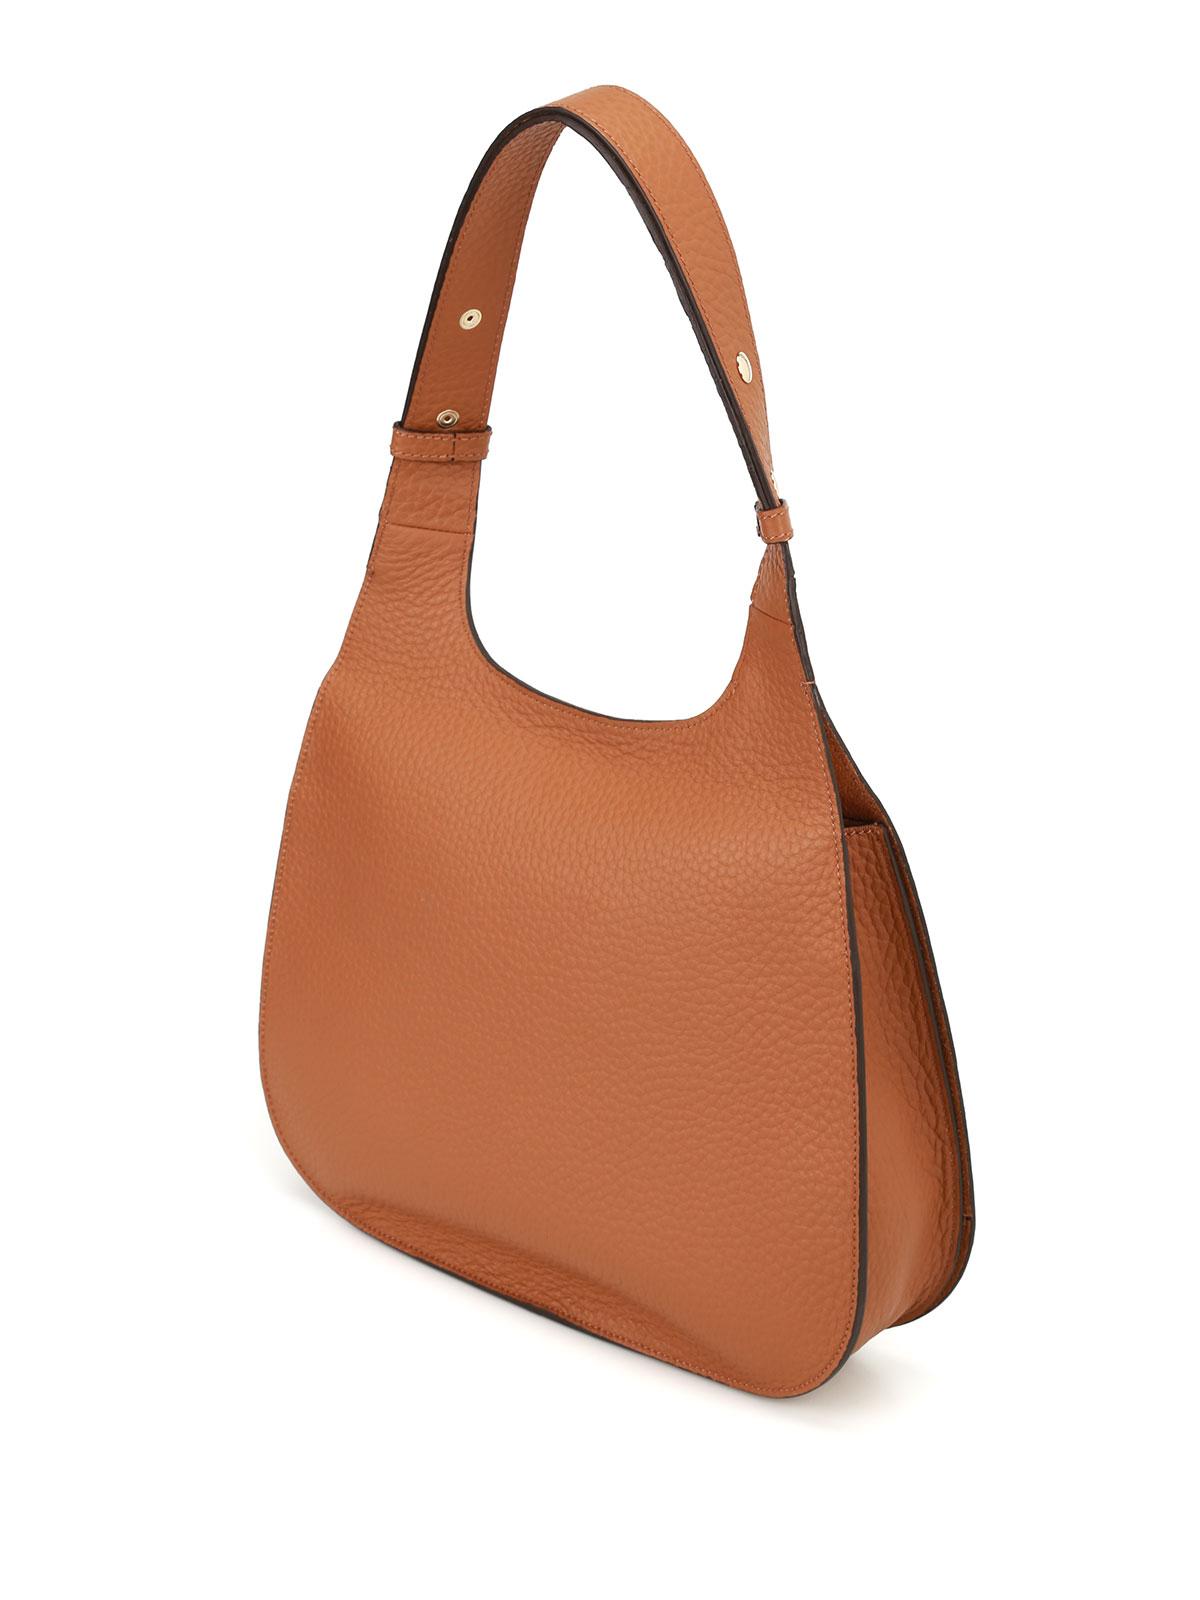 Hogan Hammered leather hobo bag ypUcO